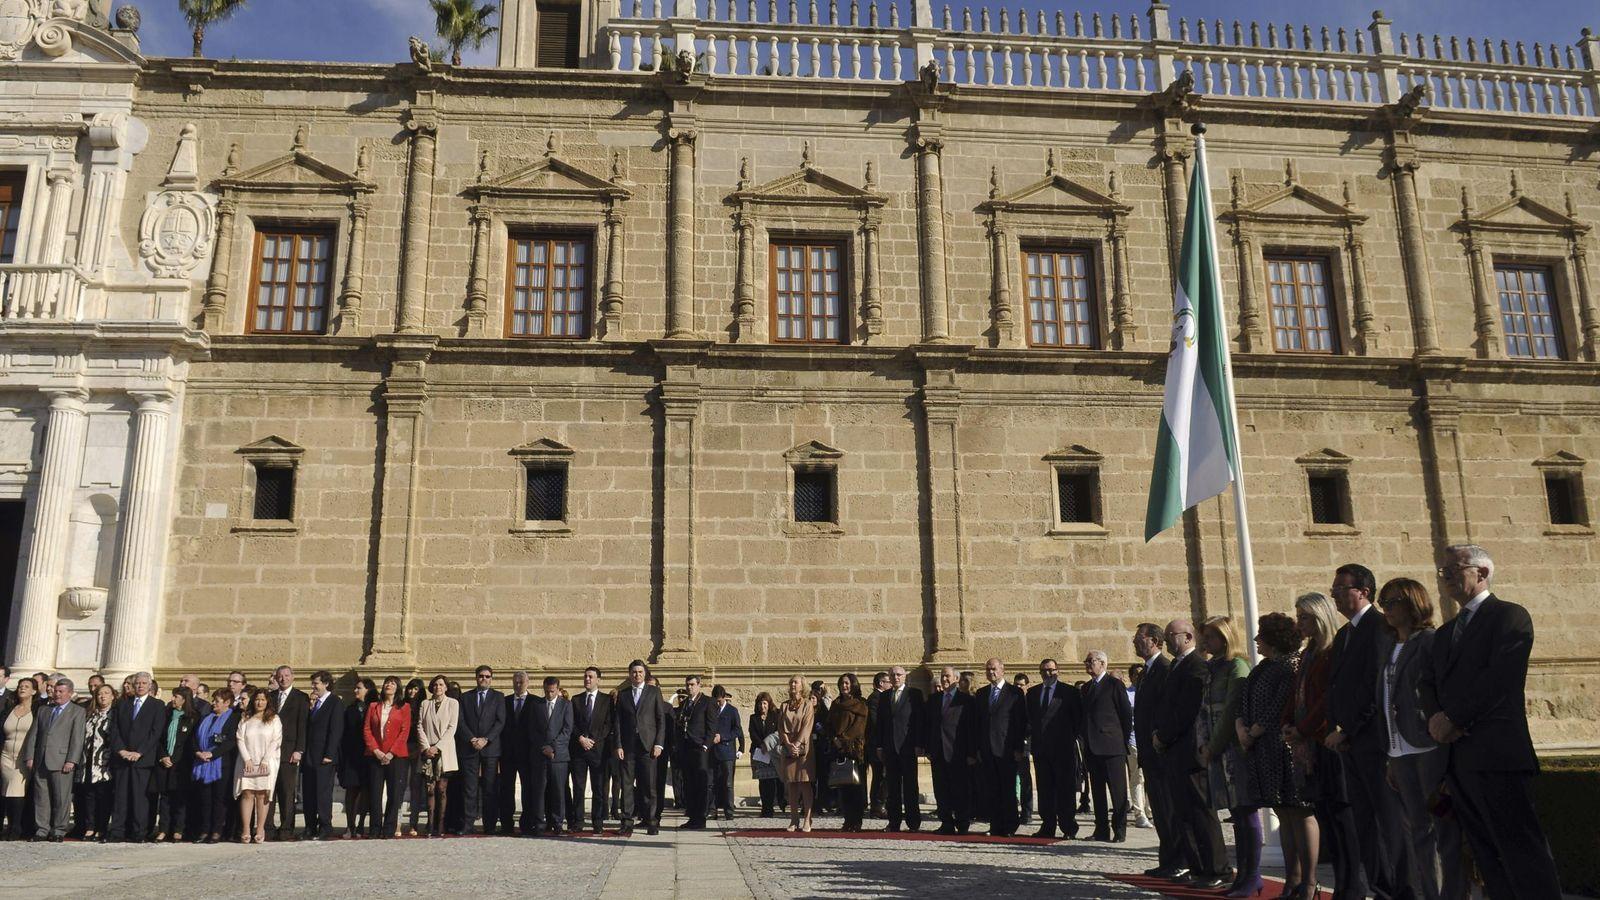 Calendario 2020 Con Festivos Andalucia.Calendario Laboral 2020 En Andalucia El 28 De Febrero